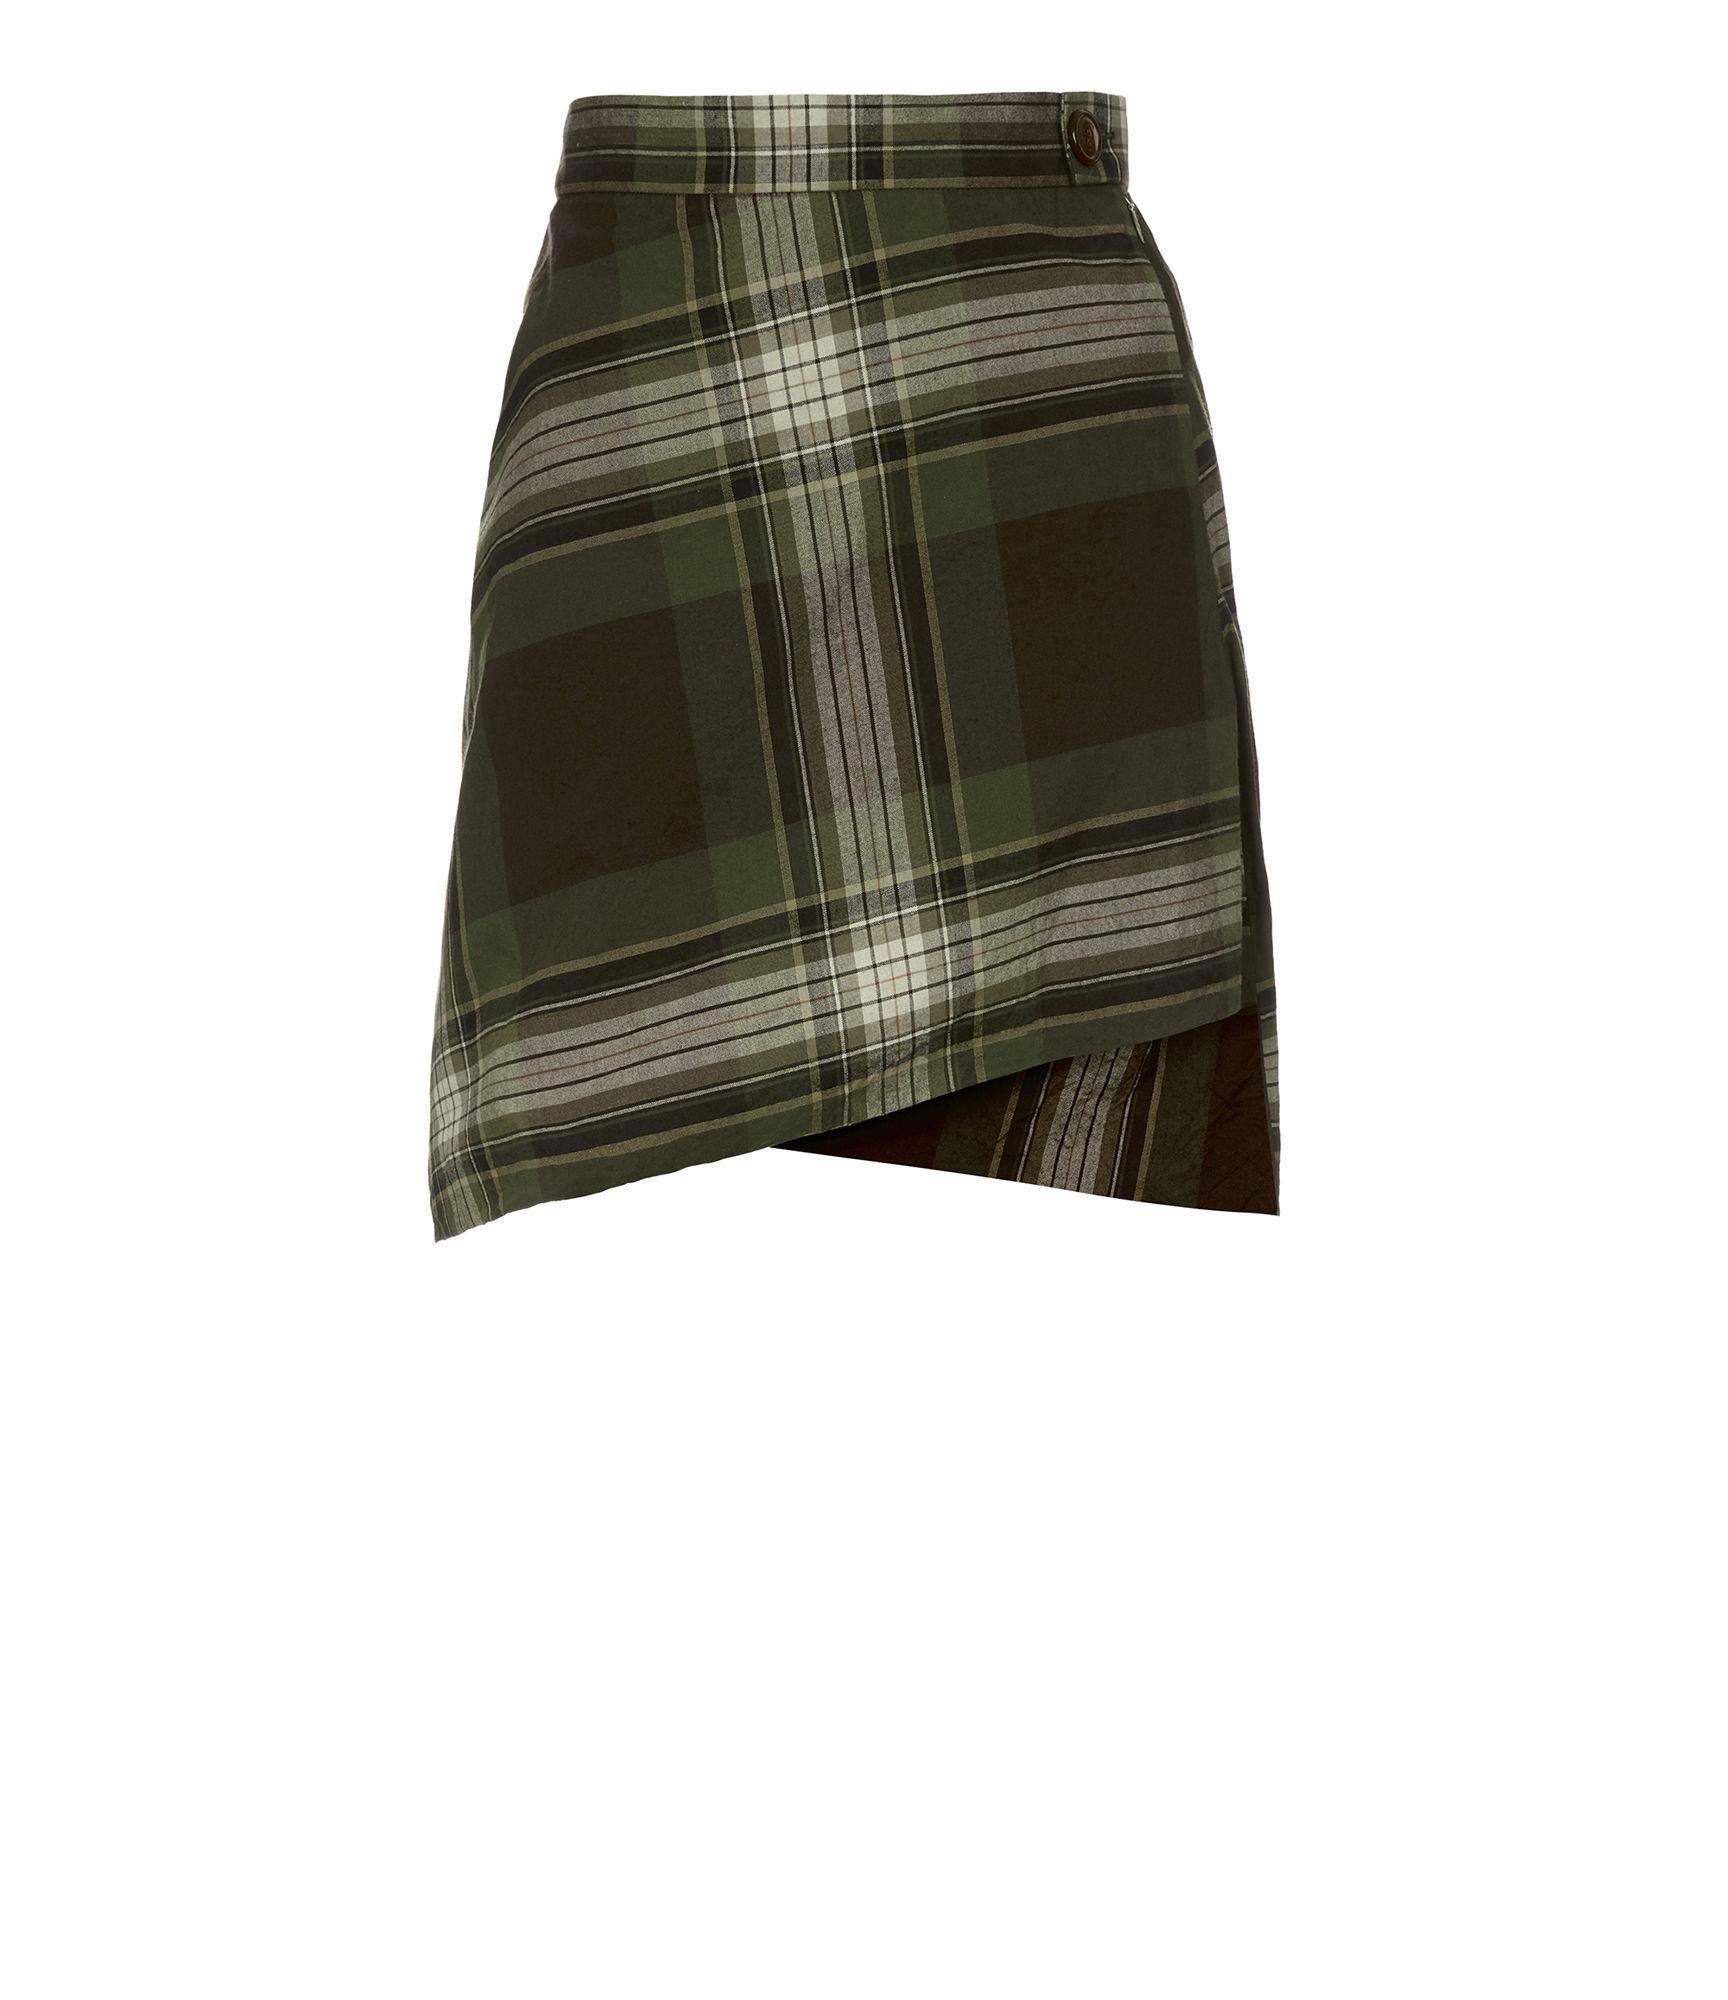 Vivienne Westwood Polina Mini Skirt Camu